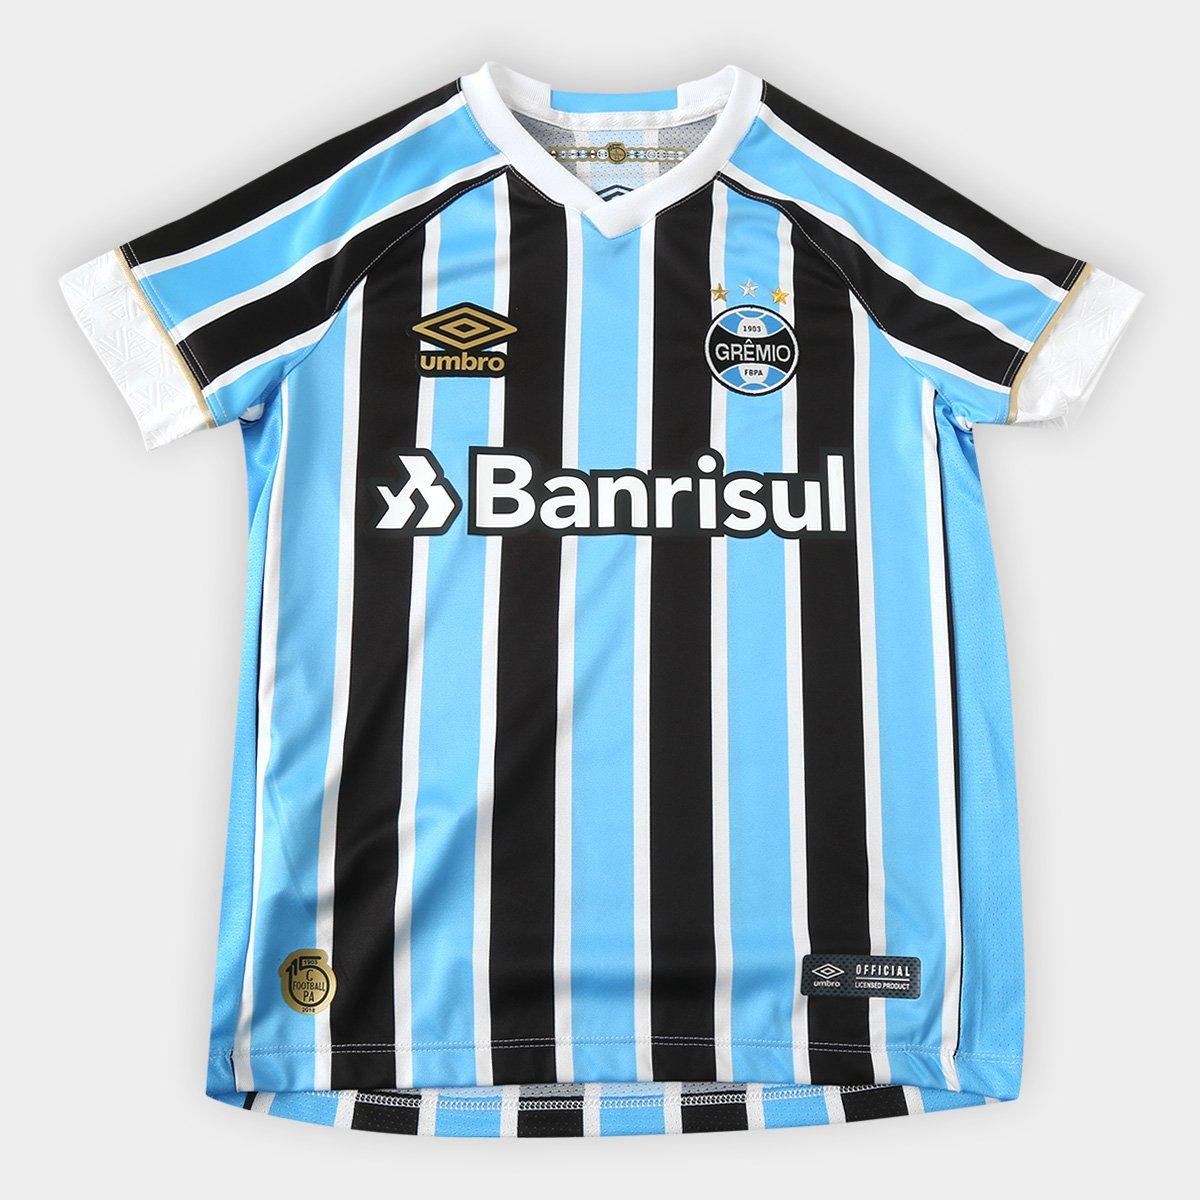 Camisa Grêmio Juvenil I 18 19 s n° Torcedor Umbro - Azul e Preto ... bcd556fae0acf